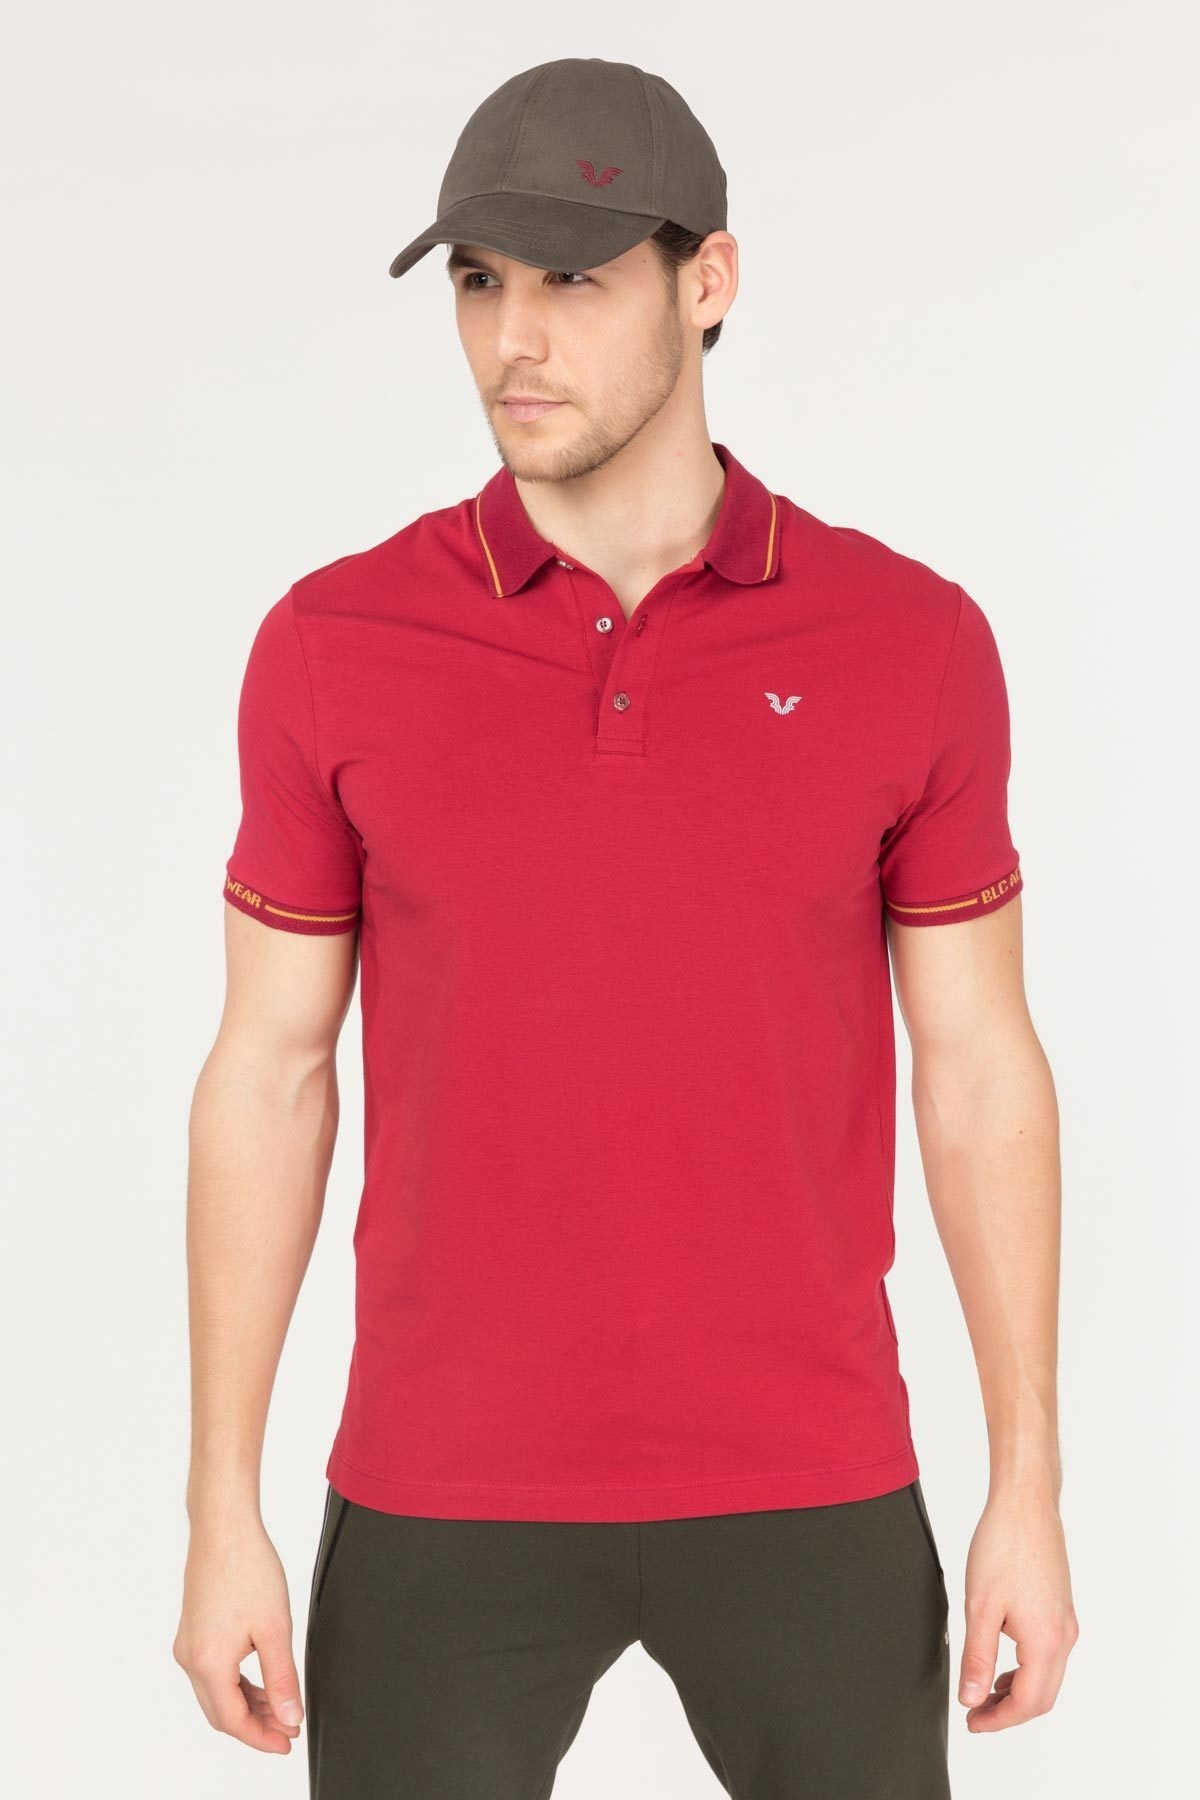 bilcee Bordo Polo Yaka Pamuklu Erkek T-Shirt FS-1759 2